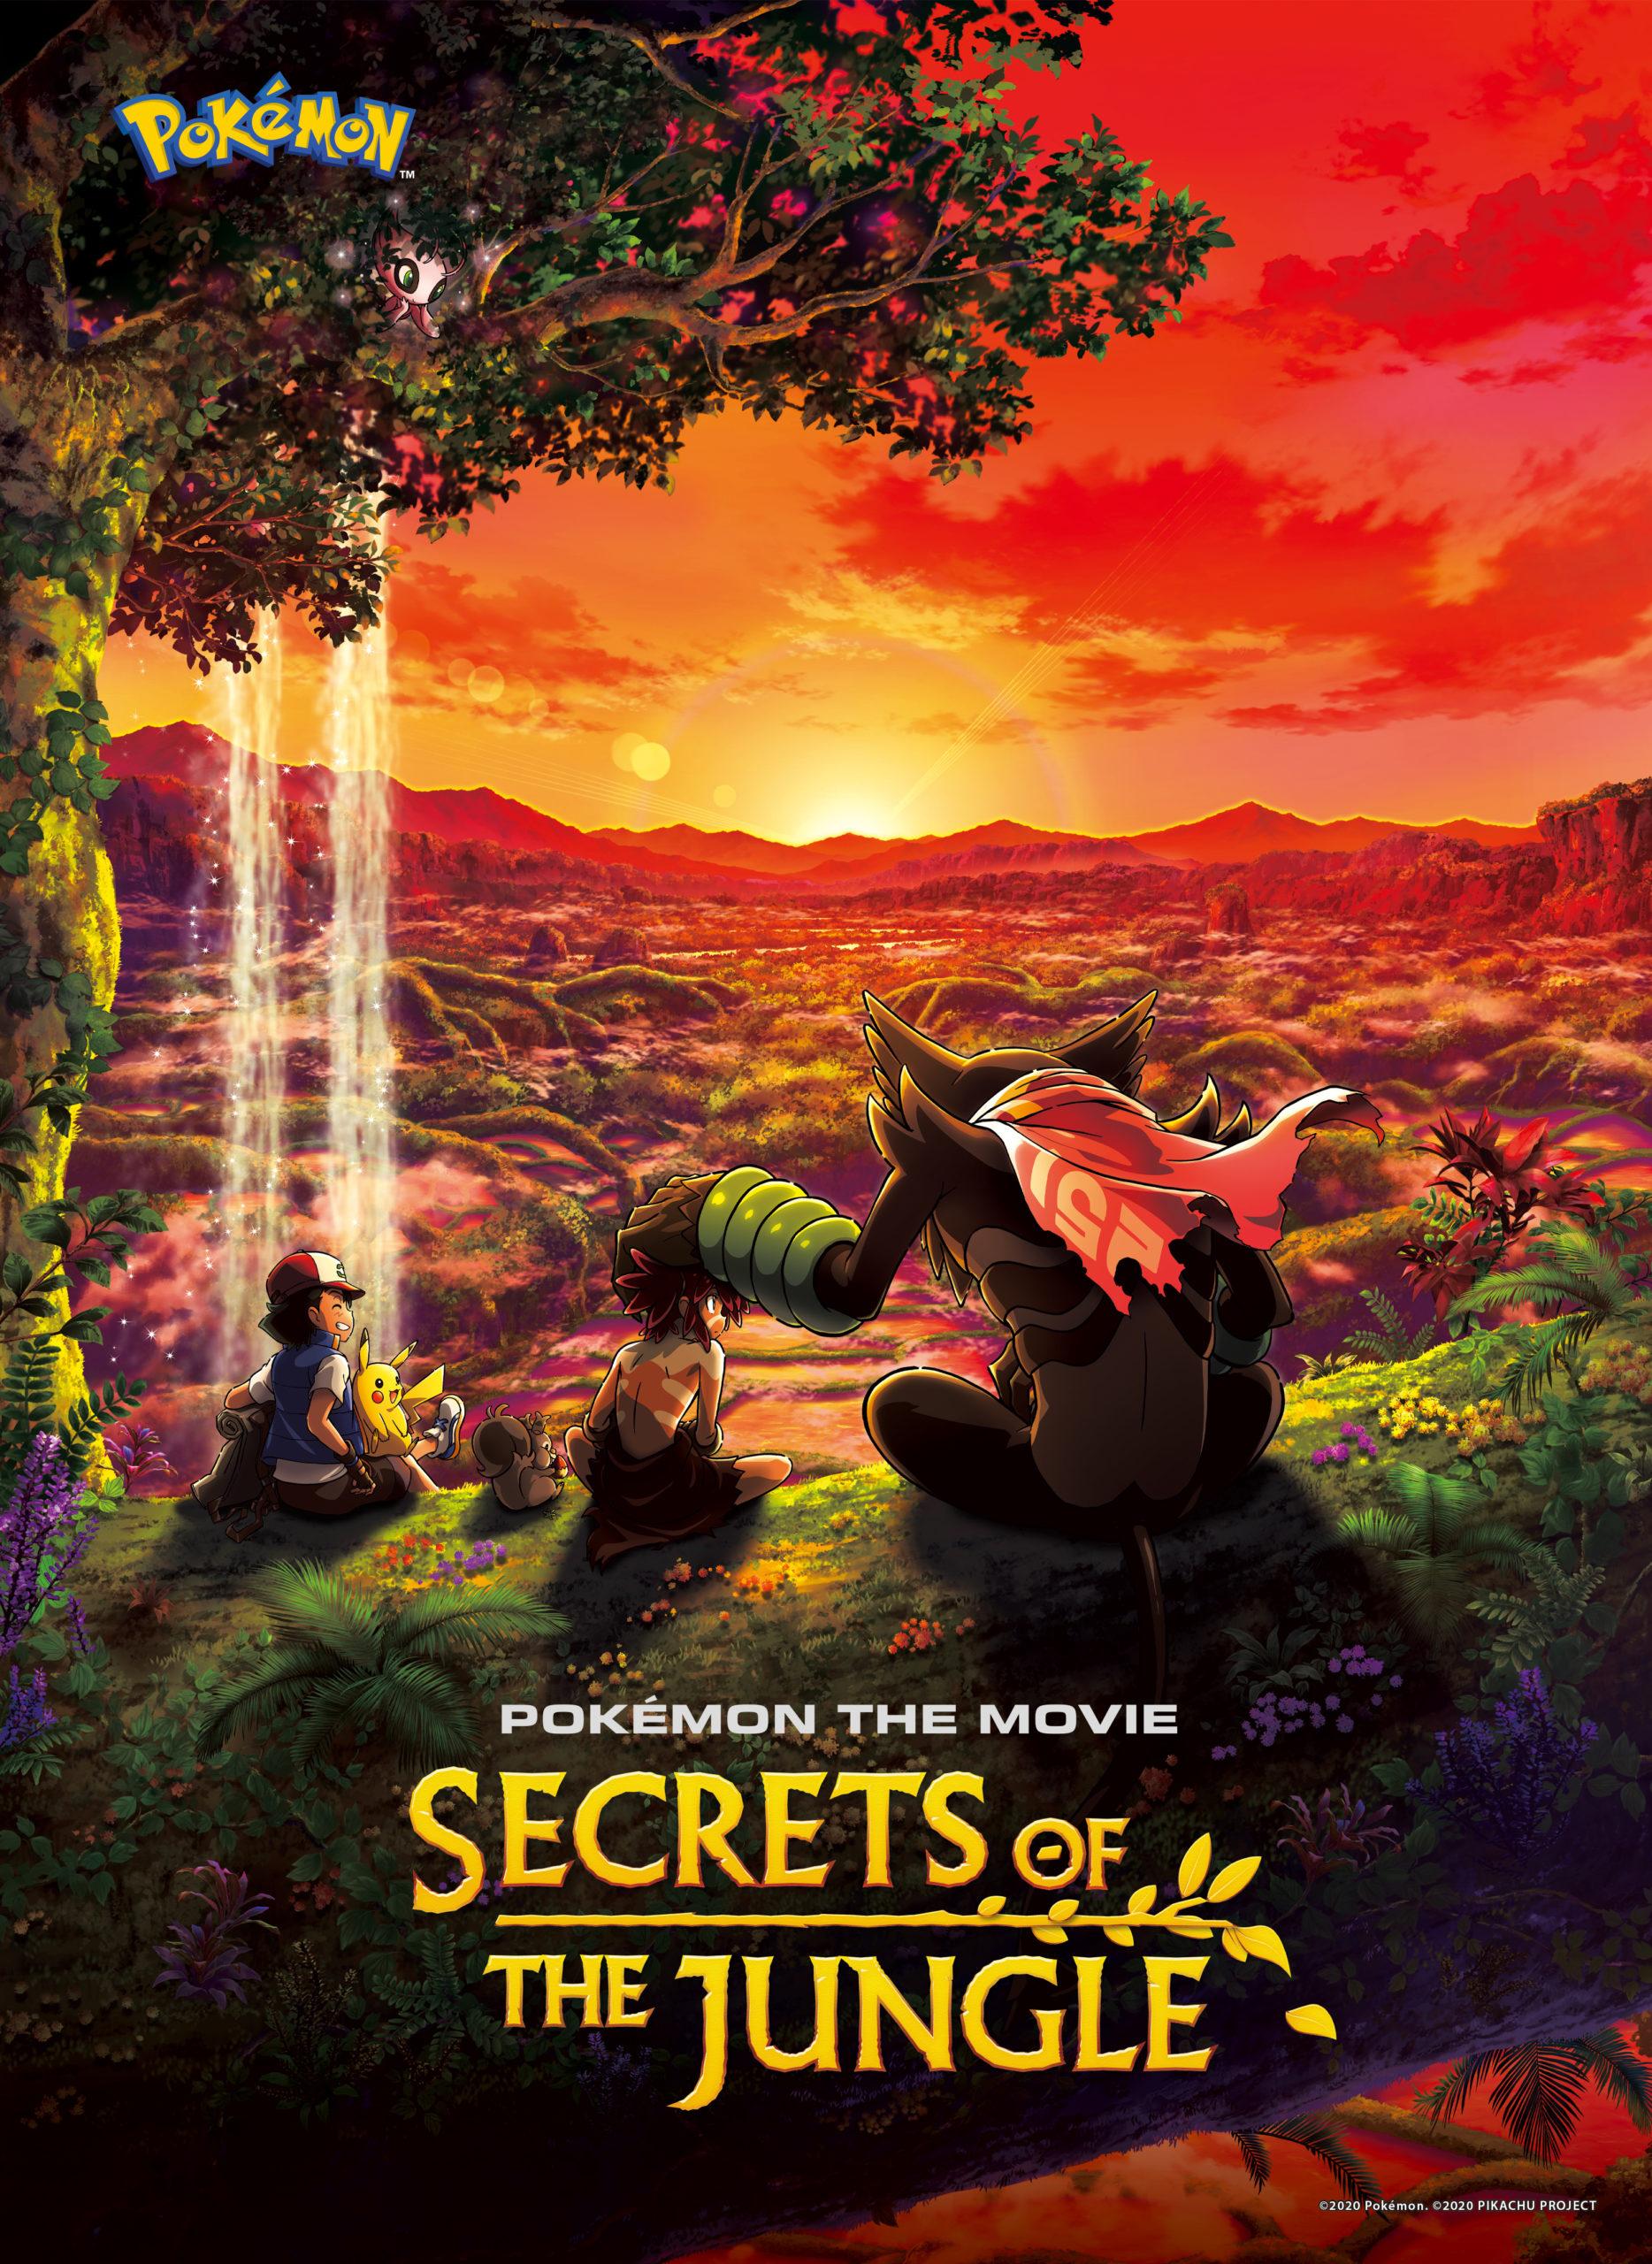 Pokémon the Movie: Secrets of the Jungle (2020) Hindi Dubbed ORG 720p Netflix HDRip 900MB Download